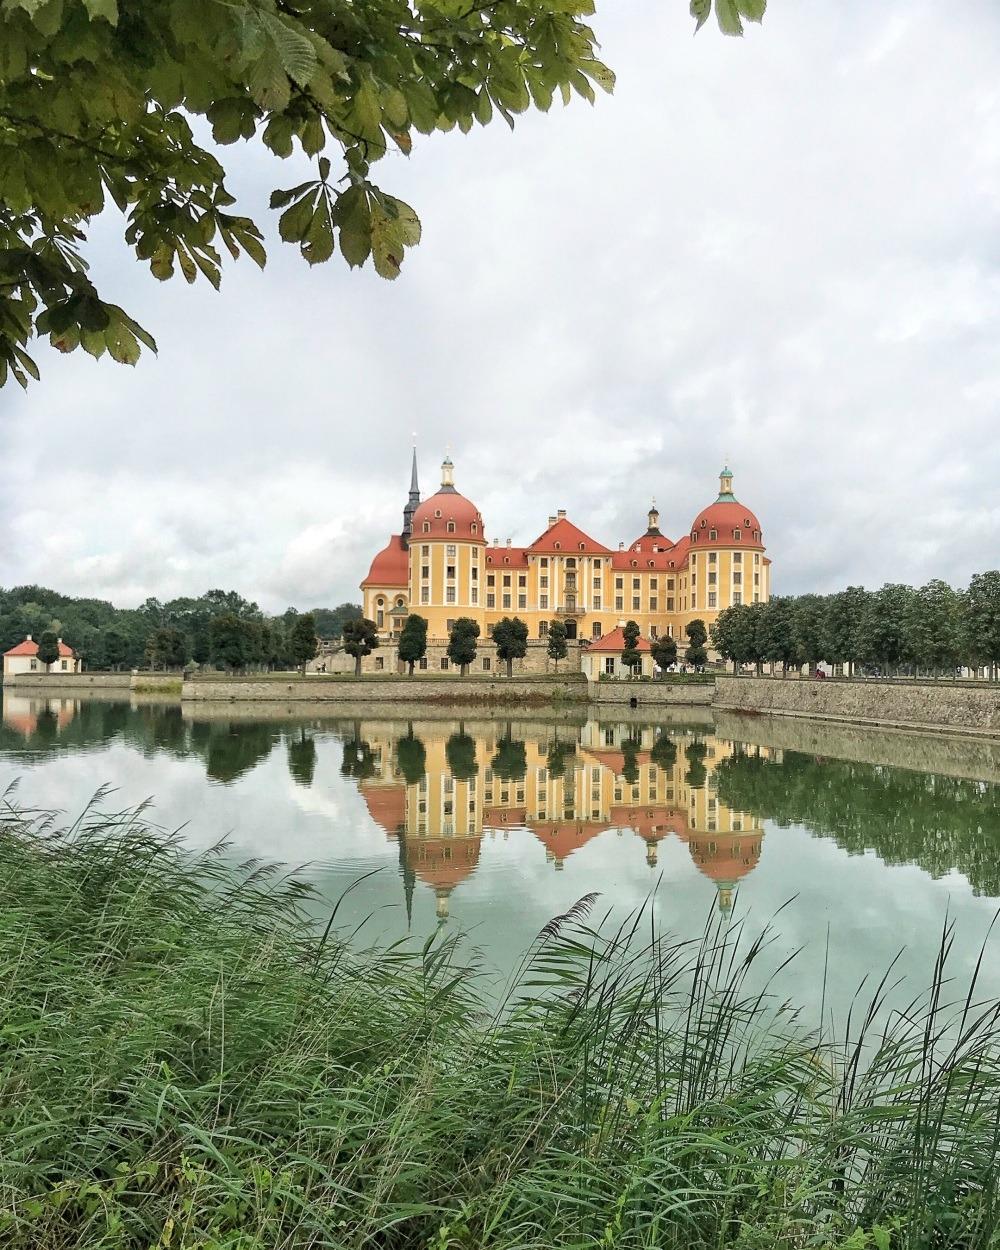 Lake at Schloss Moritzburg near Dresden Germany Photo Heatheronhertravels.com